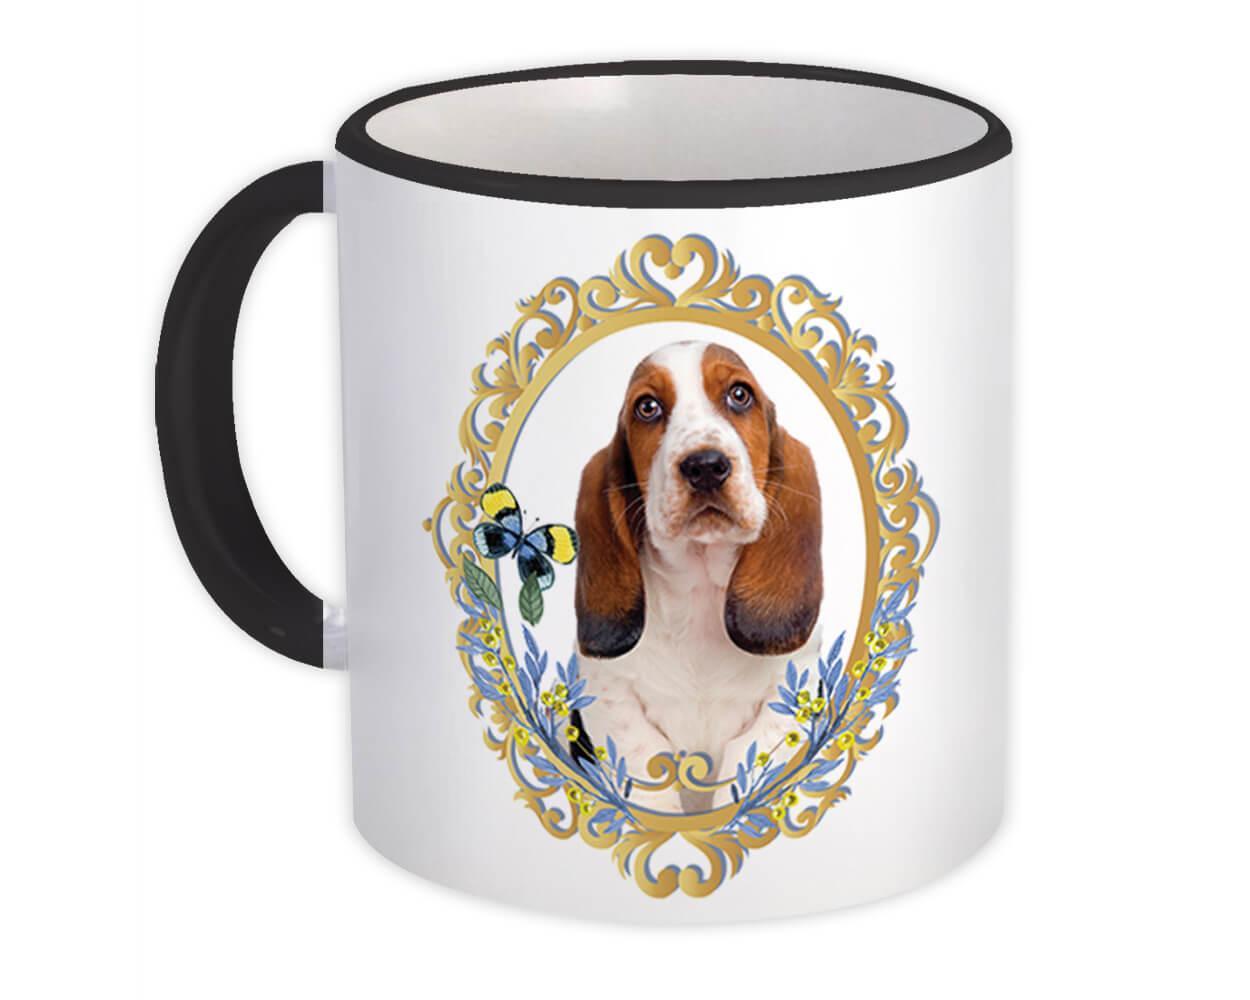 Basset on Frame : Gift Mug Butterfly Pet Dog Animal Canine Pets Dogs